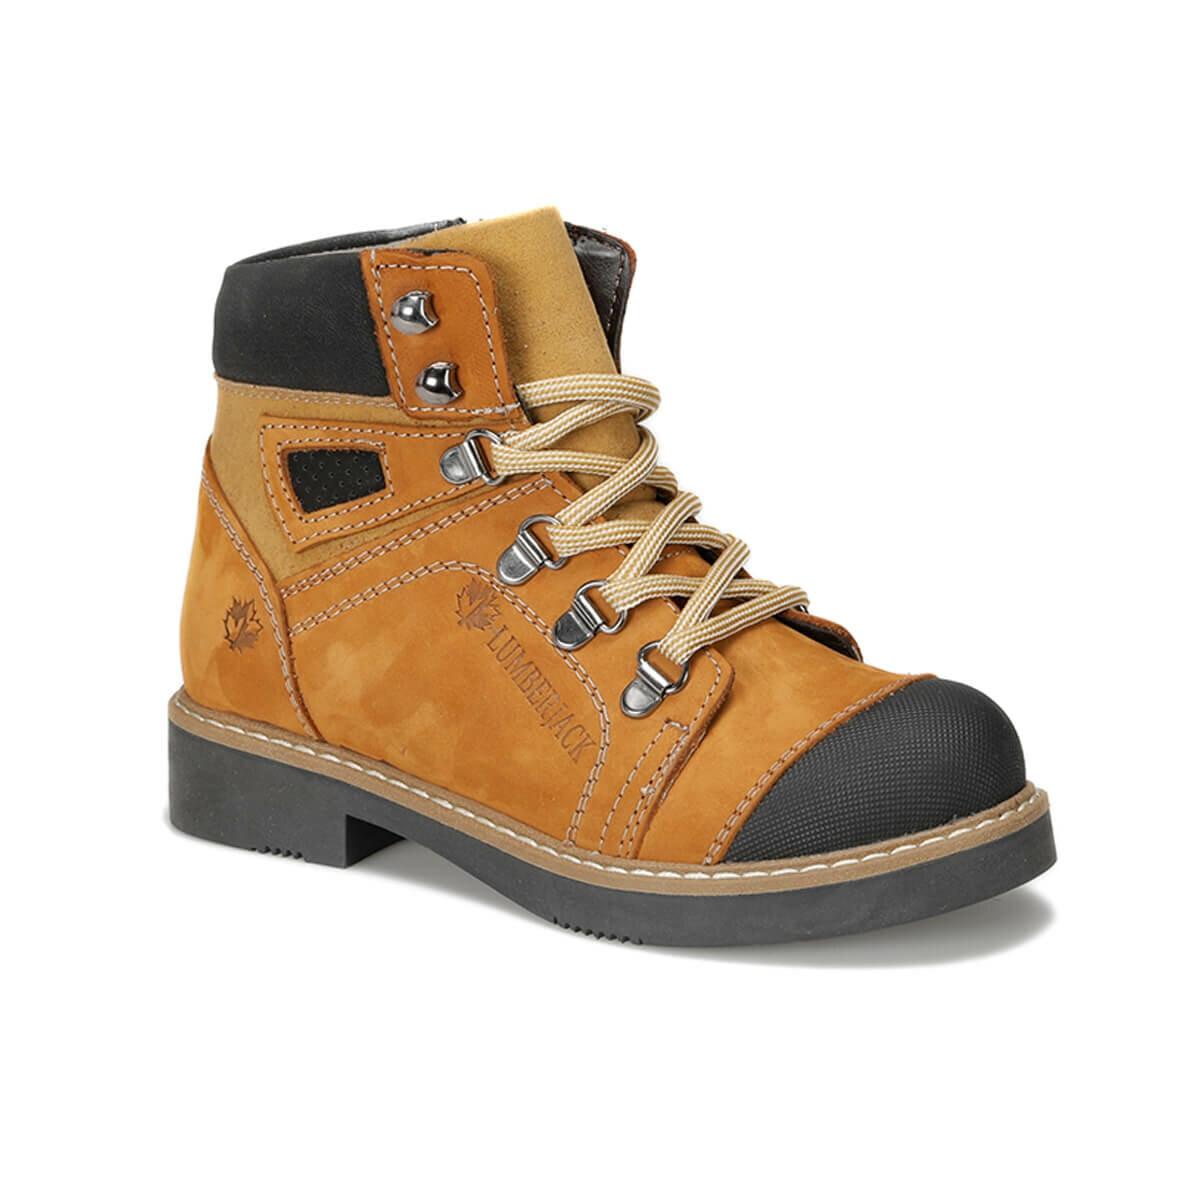 FLO AGATE 9PR Yellow Male Child Boots LUMBERJACK